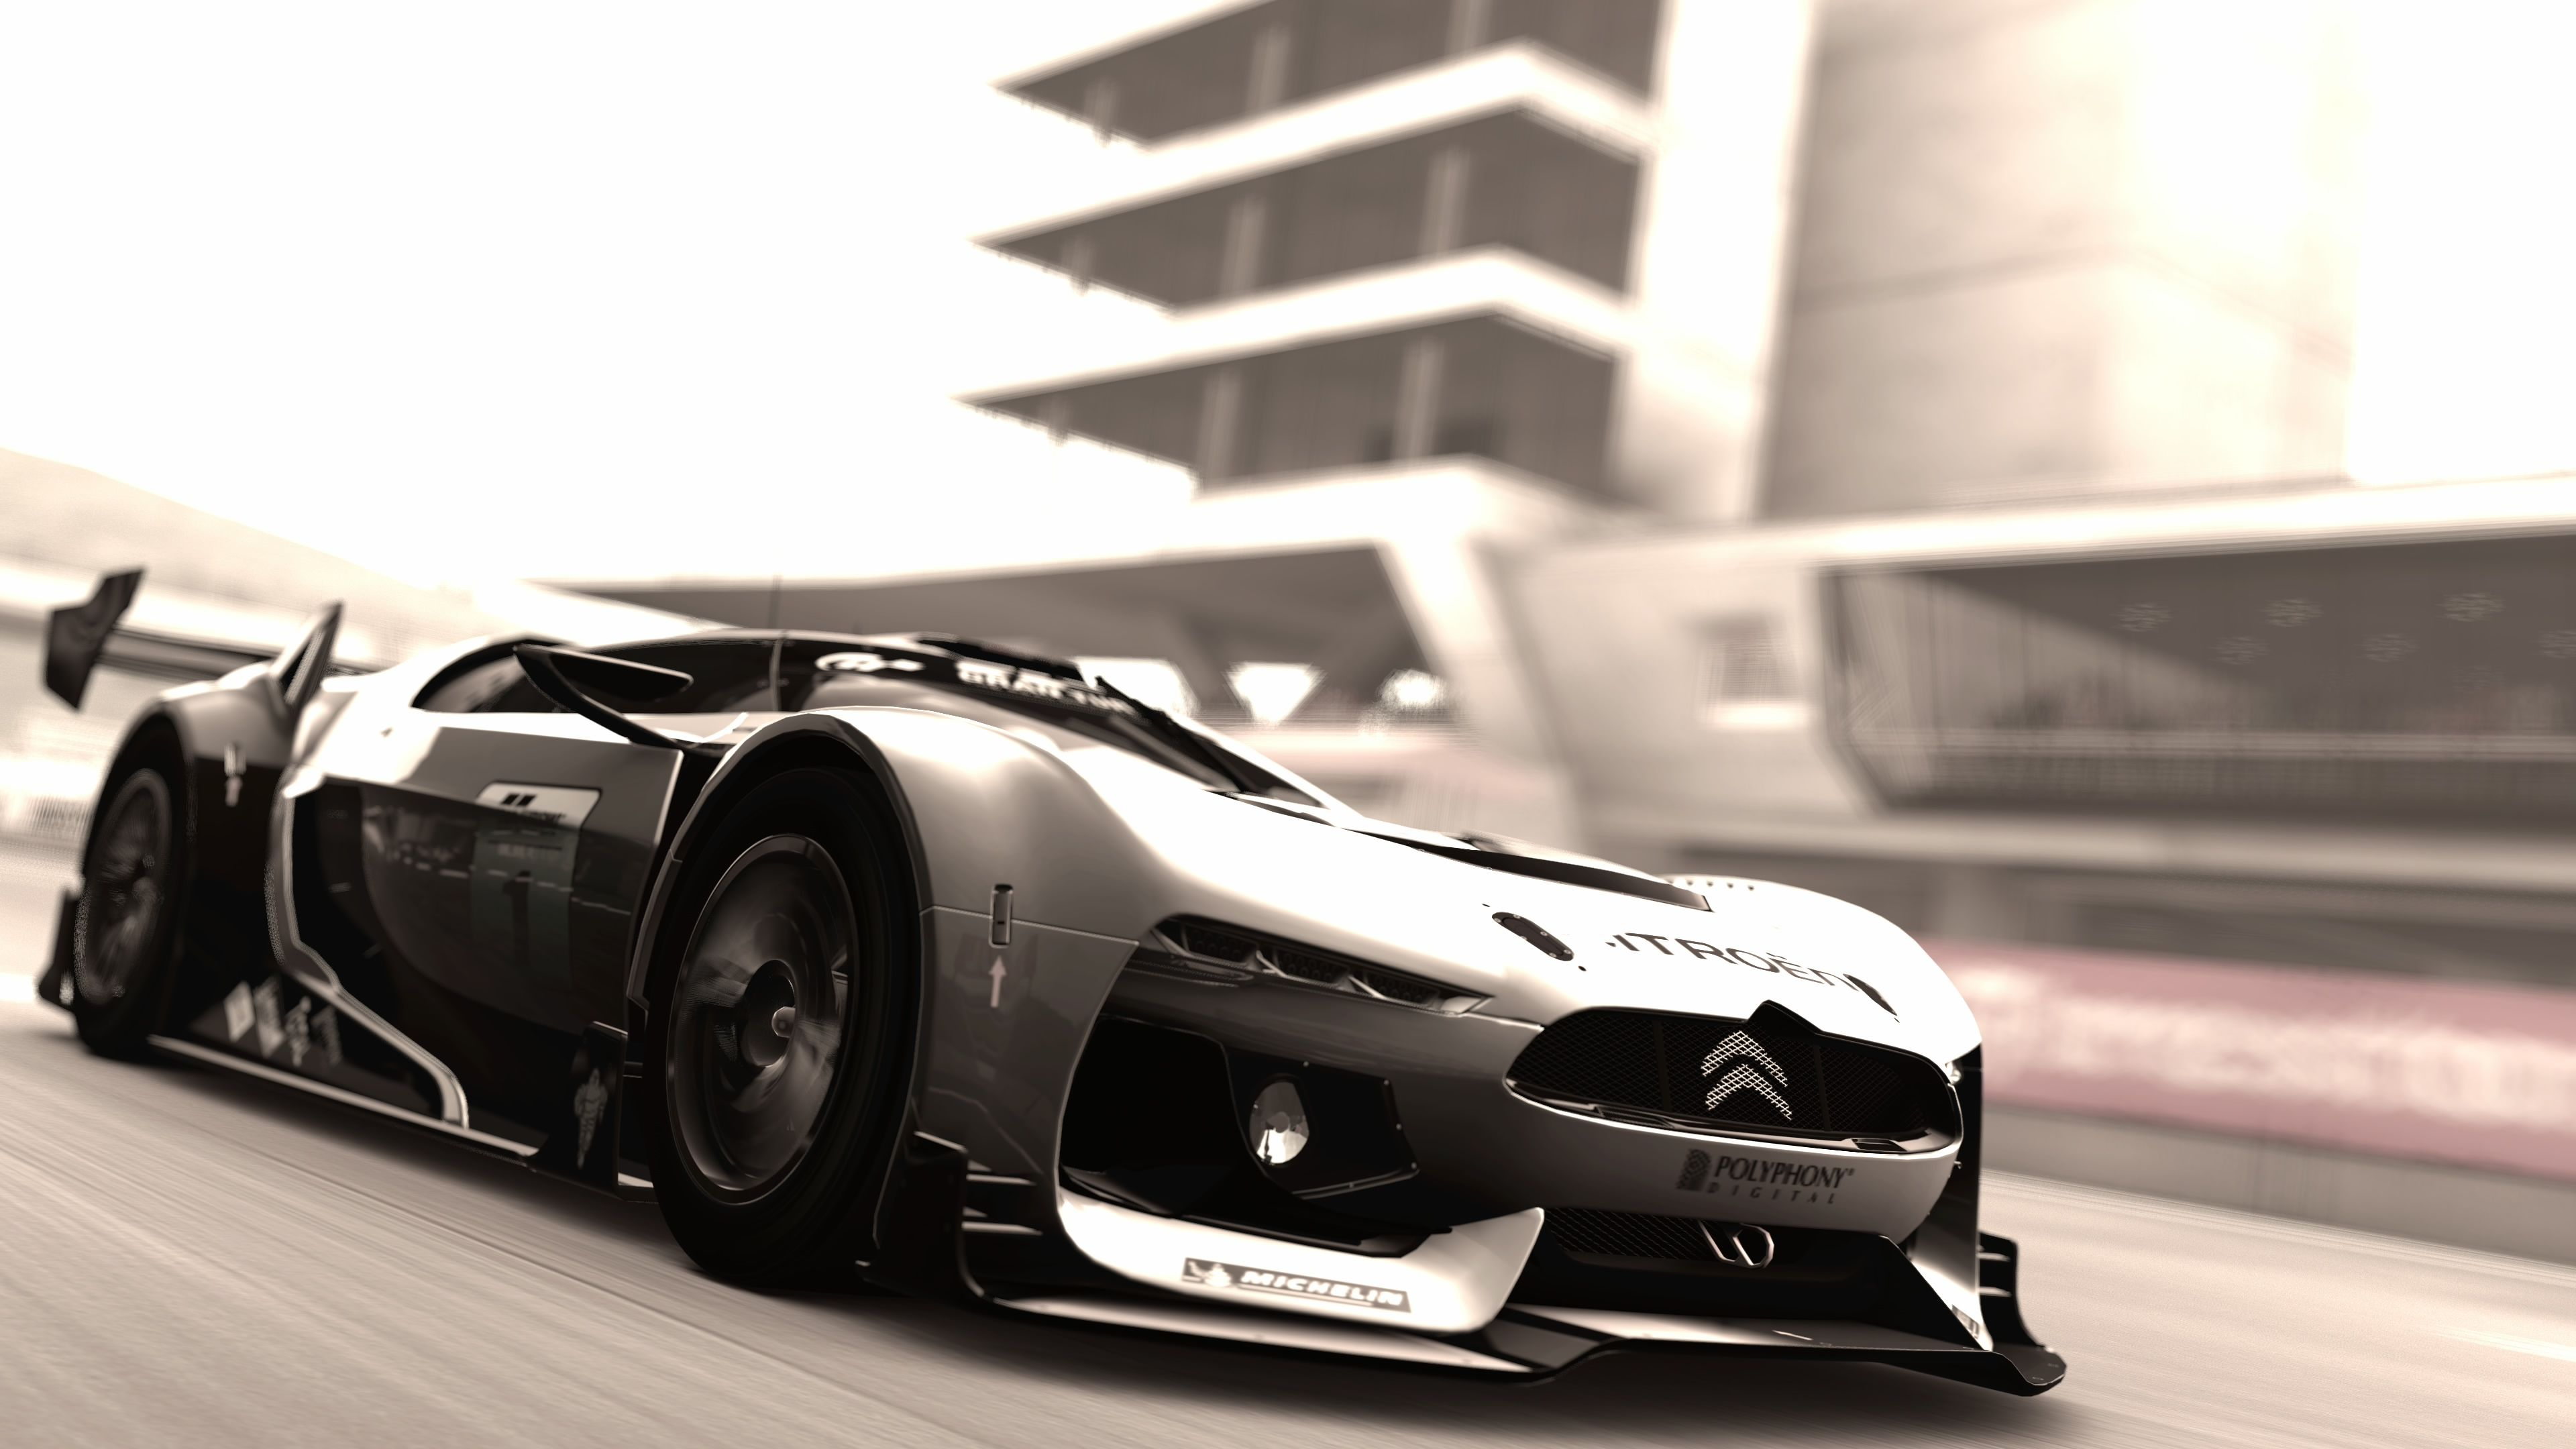 Gran Turismo 5 Car Ultra Hd Wallpaper Cars Car Wallpapers Car